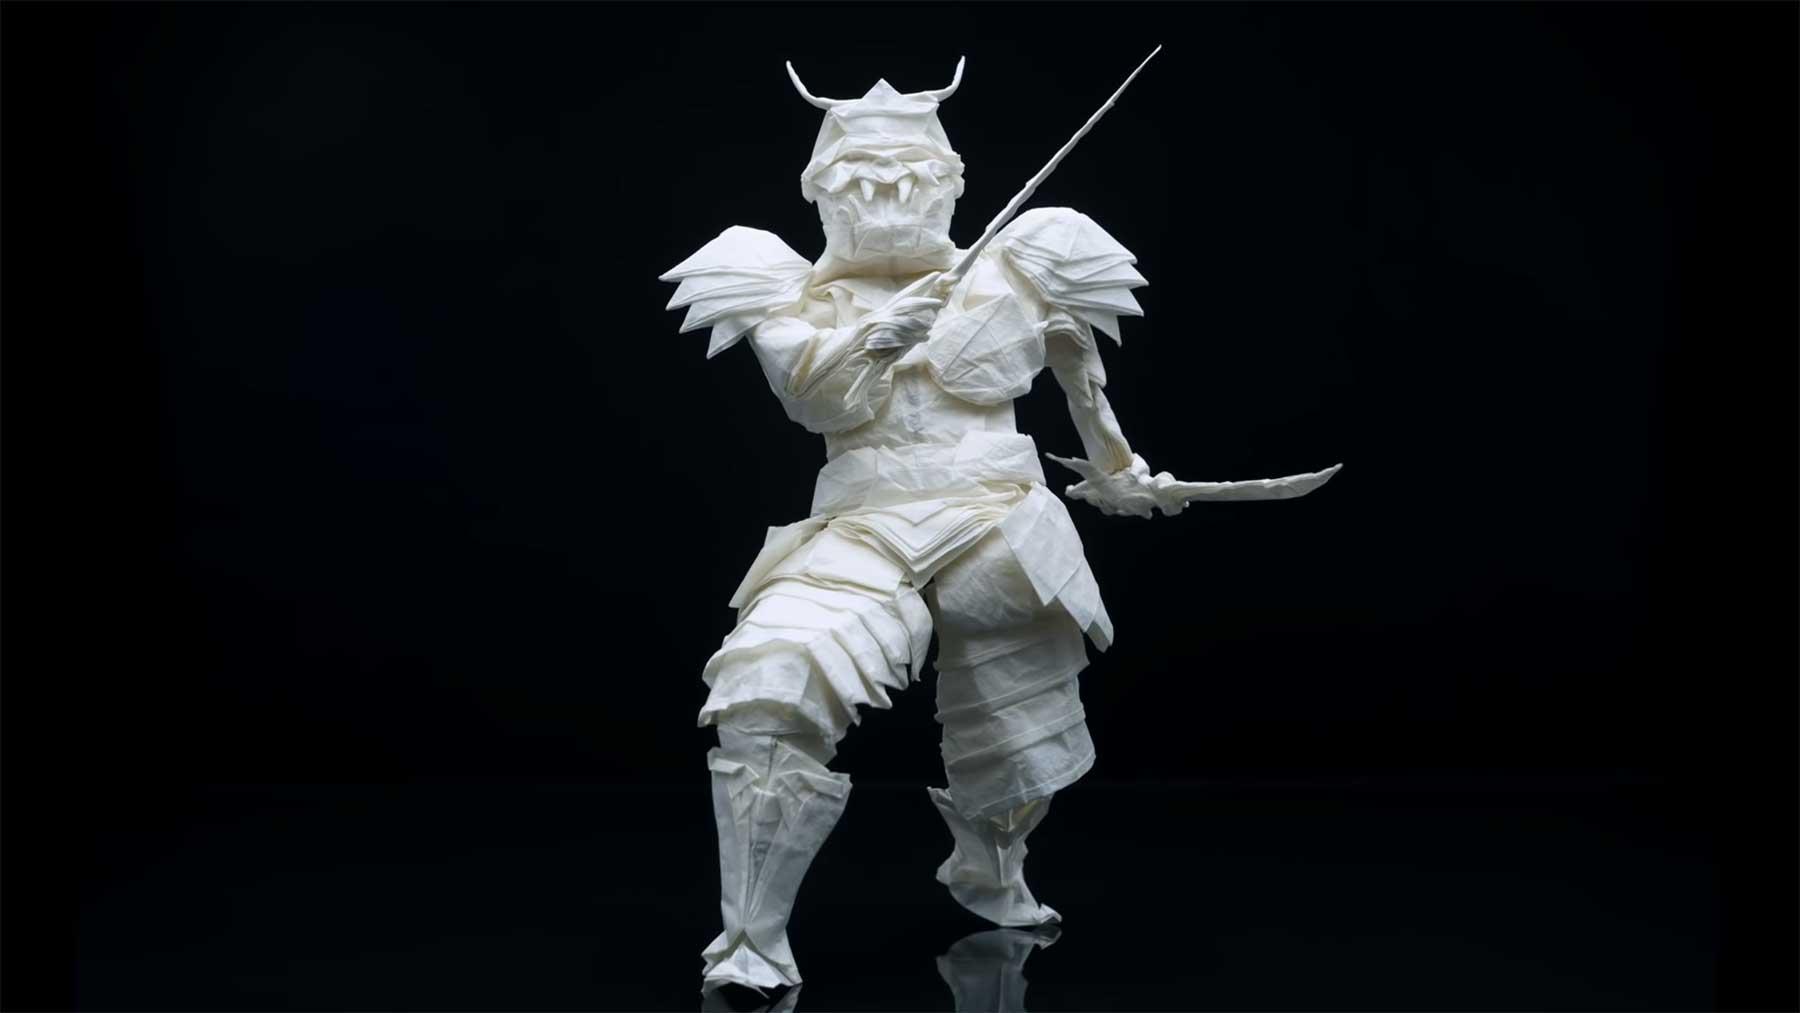 Origami-Samurai aus einem Blatt Papier falten